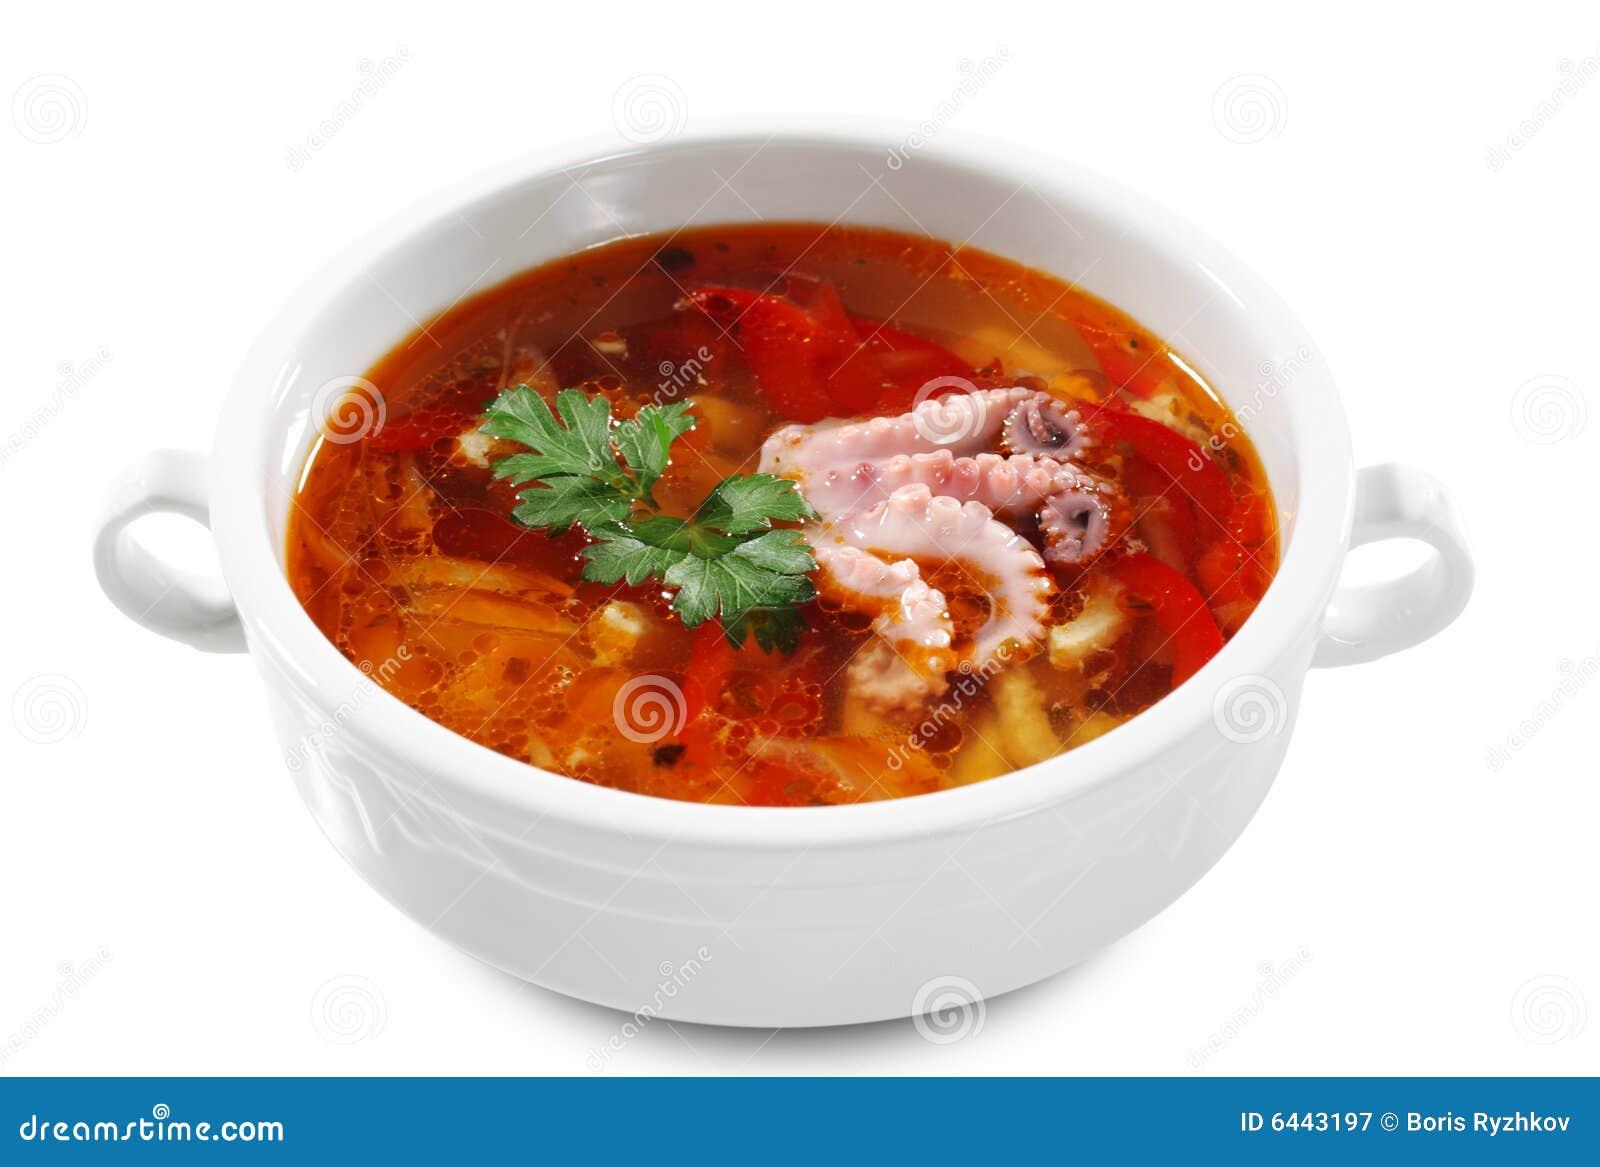 Cuisine russe et ukrainienne - poisson Solyanka